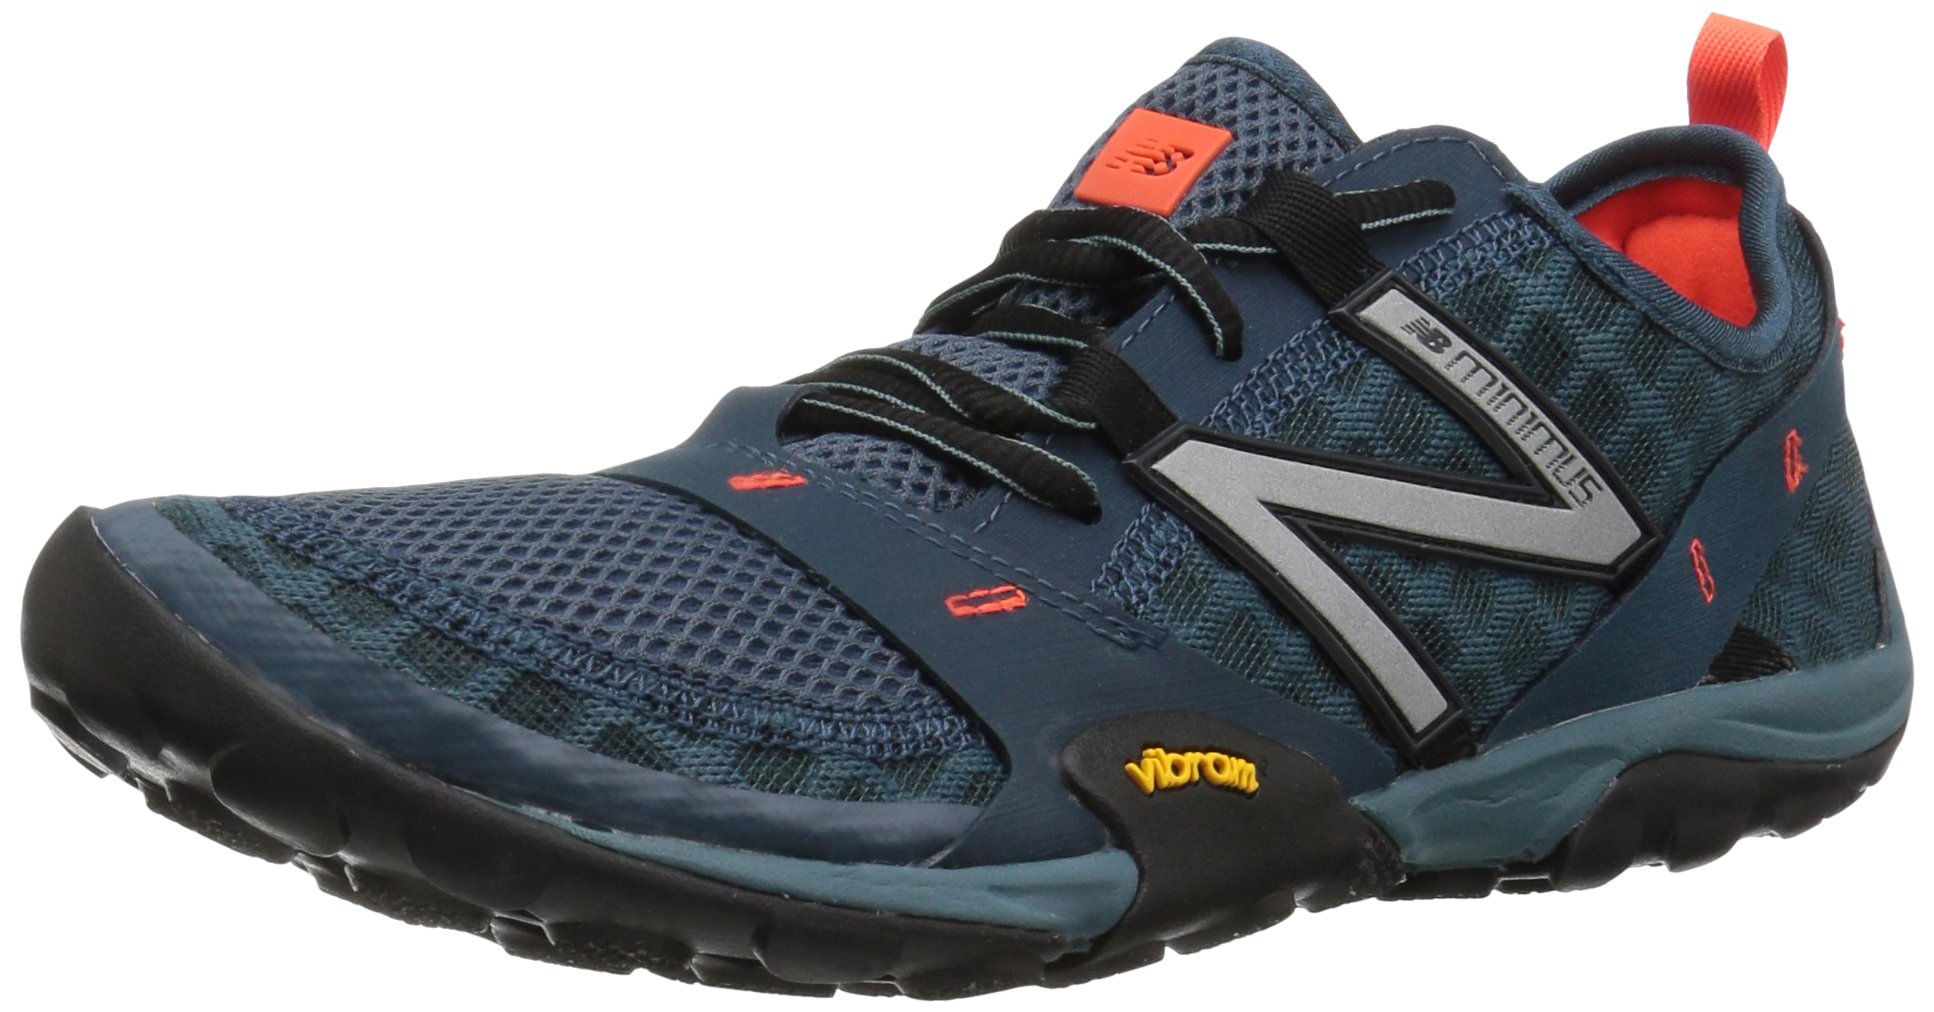 New Balance Men's MT10V1 Minimus Trail Running Shoe, Grey/Orange, 10.5 D US